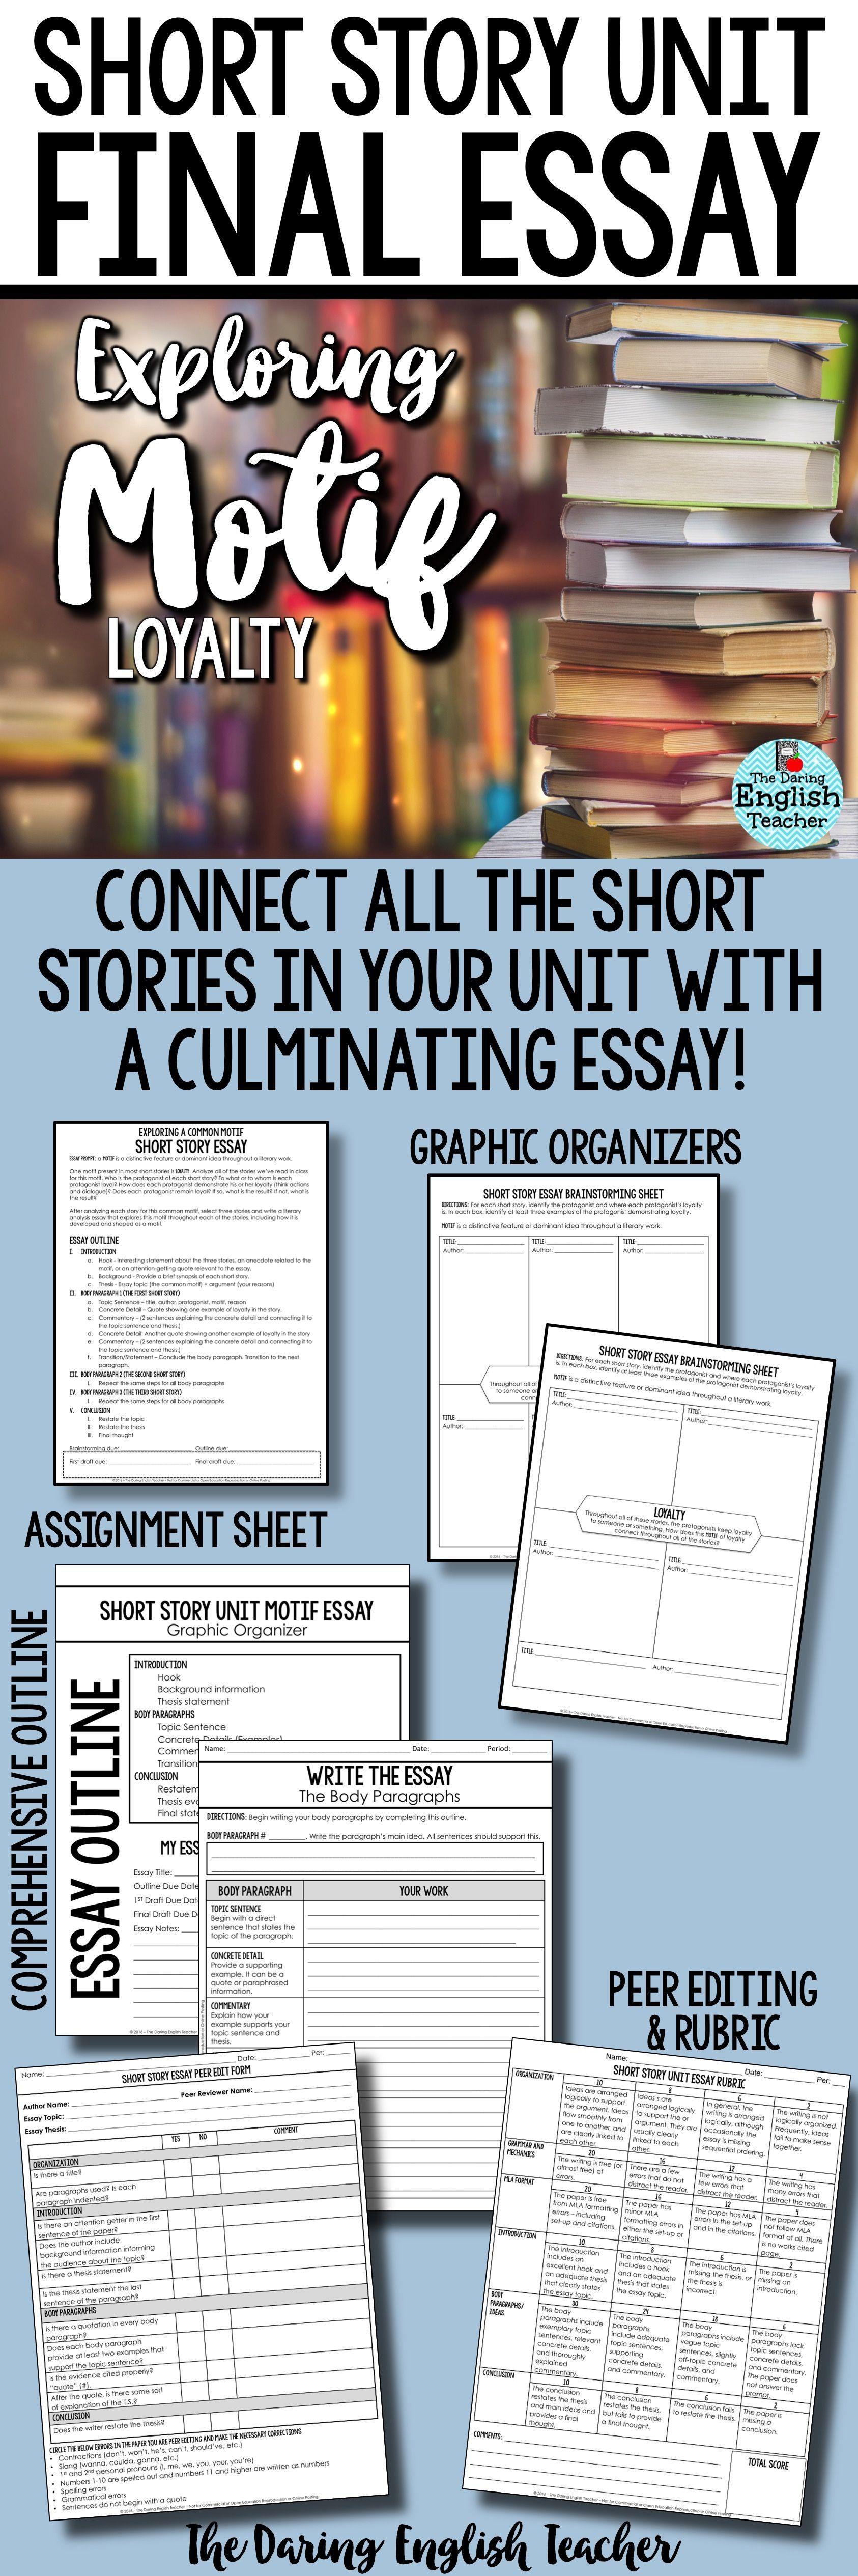 Mla Citation For Essays  Essay On E Waste also Courage Essay English Essay Short Story  Zorobraggsco Good Classification Essay Topics